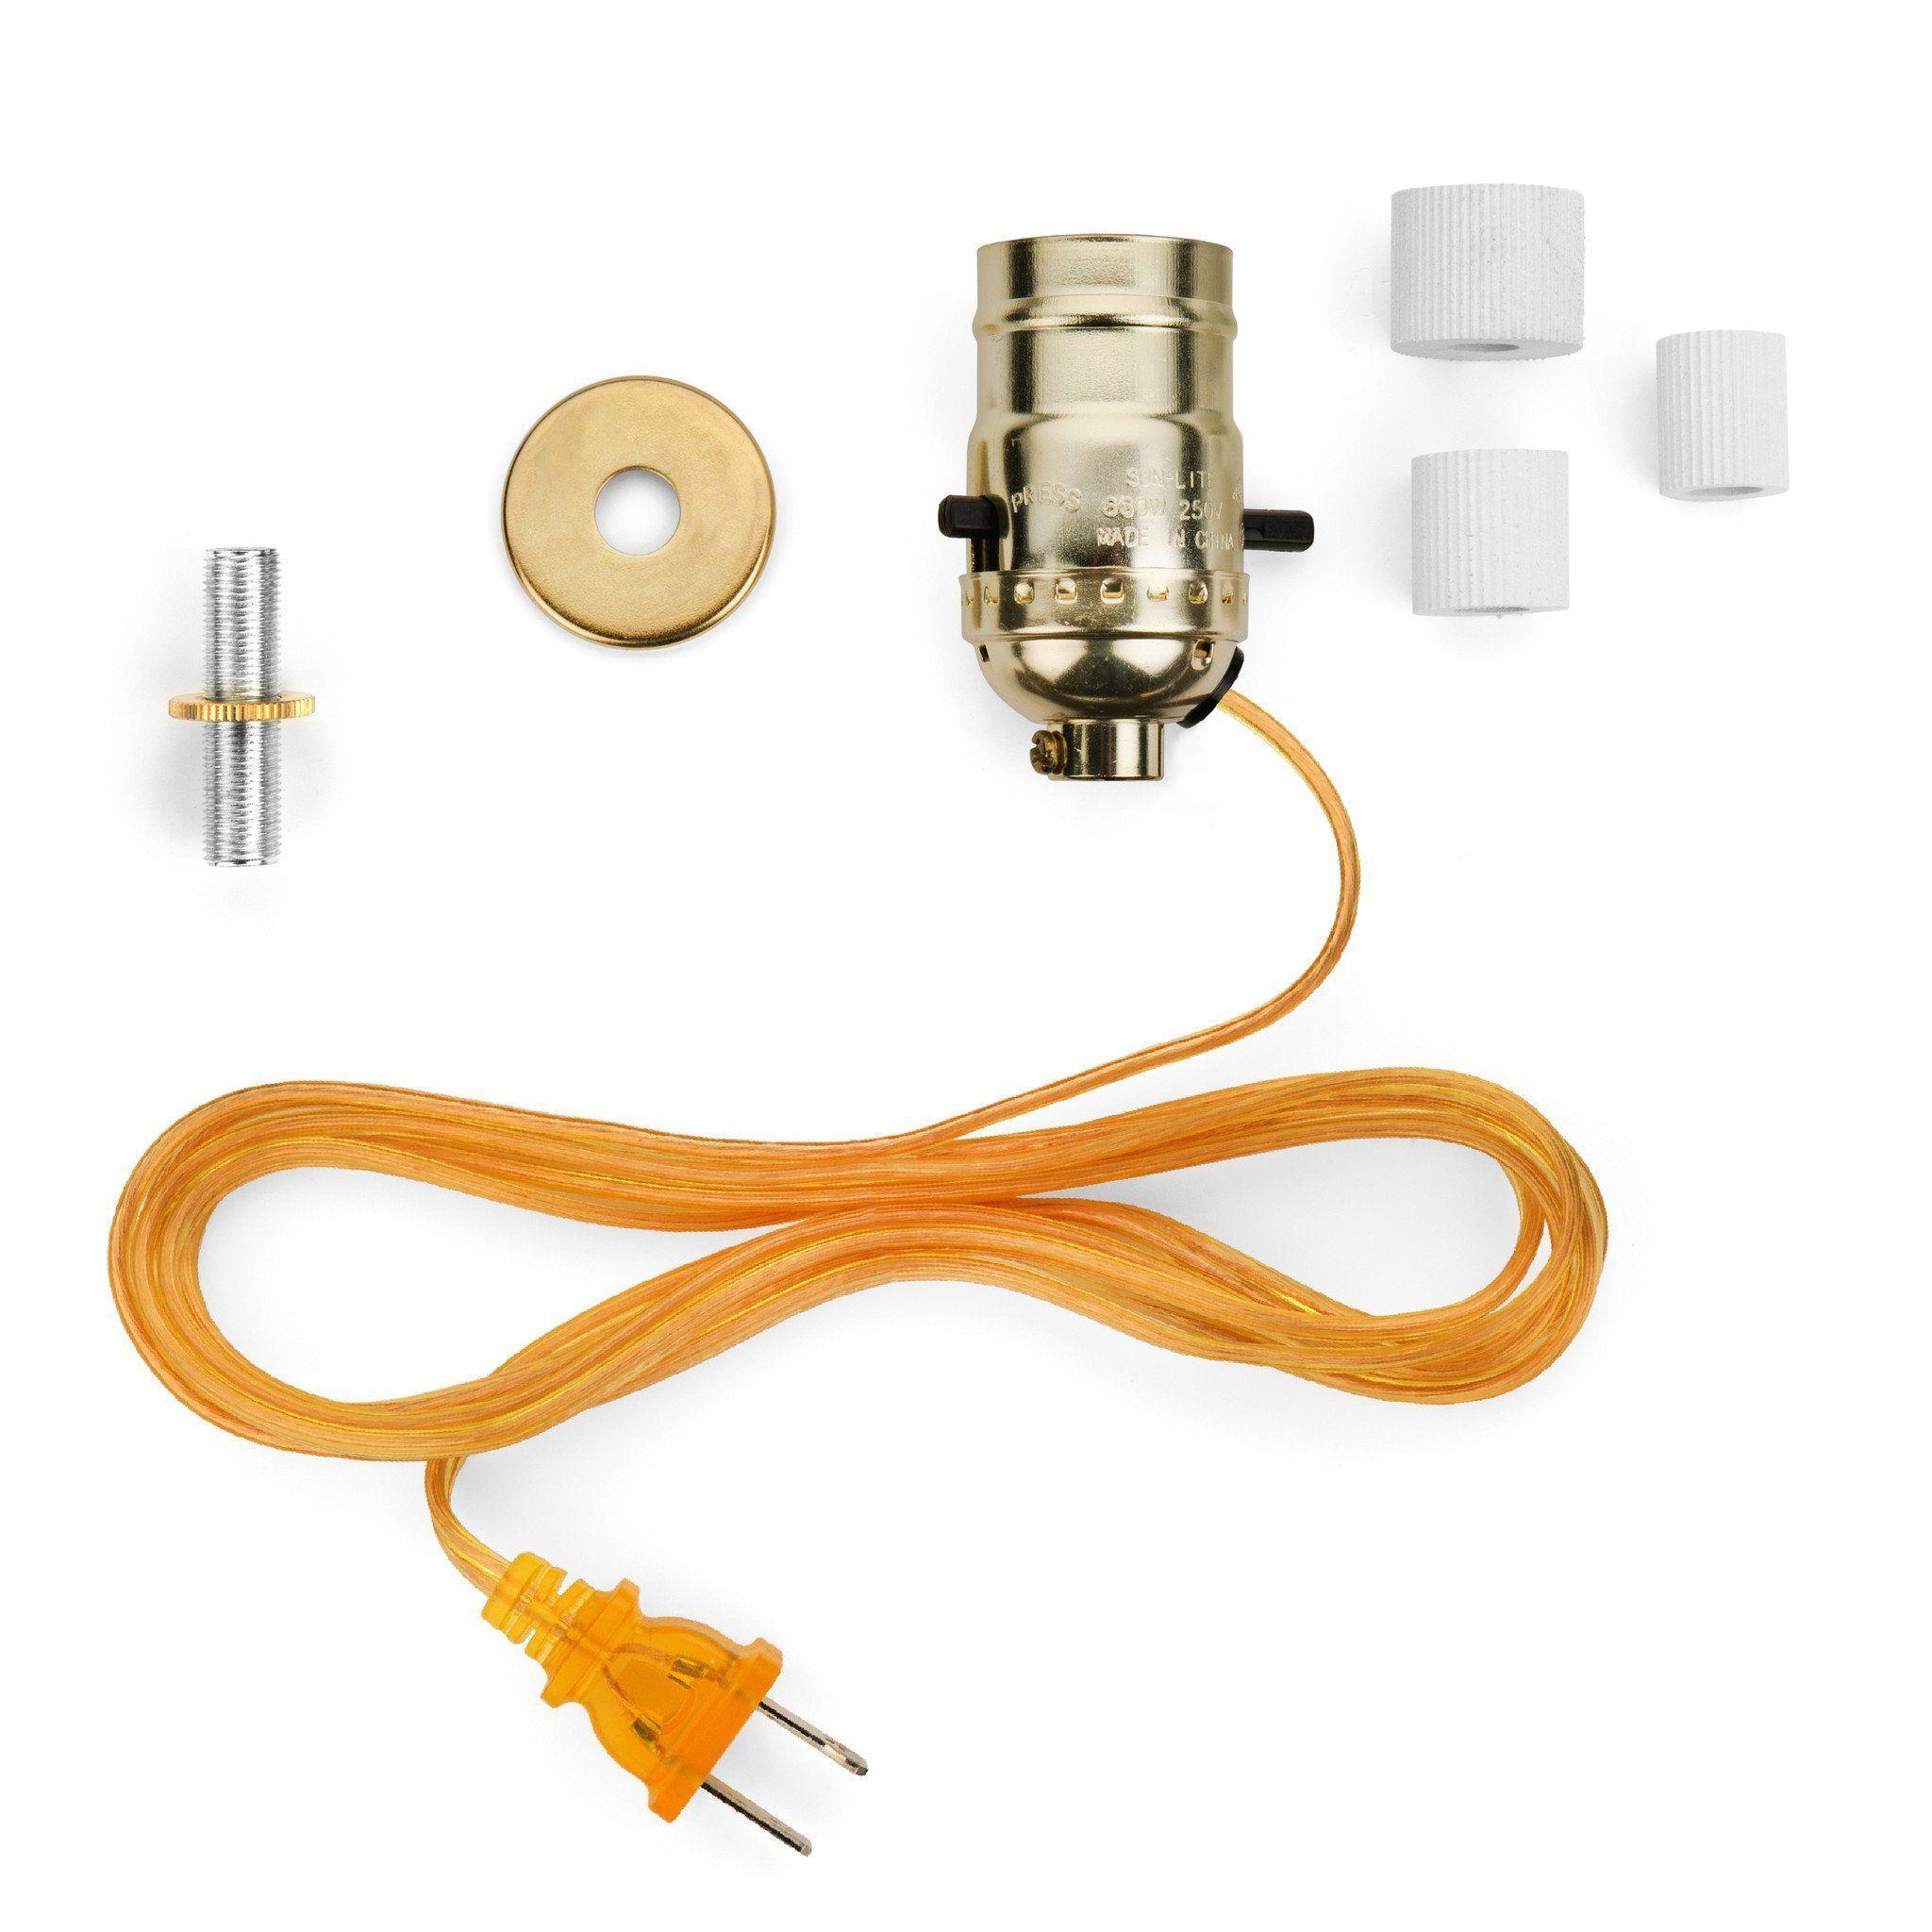 Wiring Diagrams Lamp Rewiring Kits Lighting Supplies With